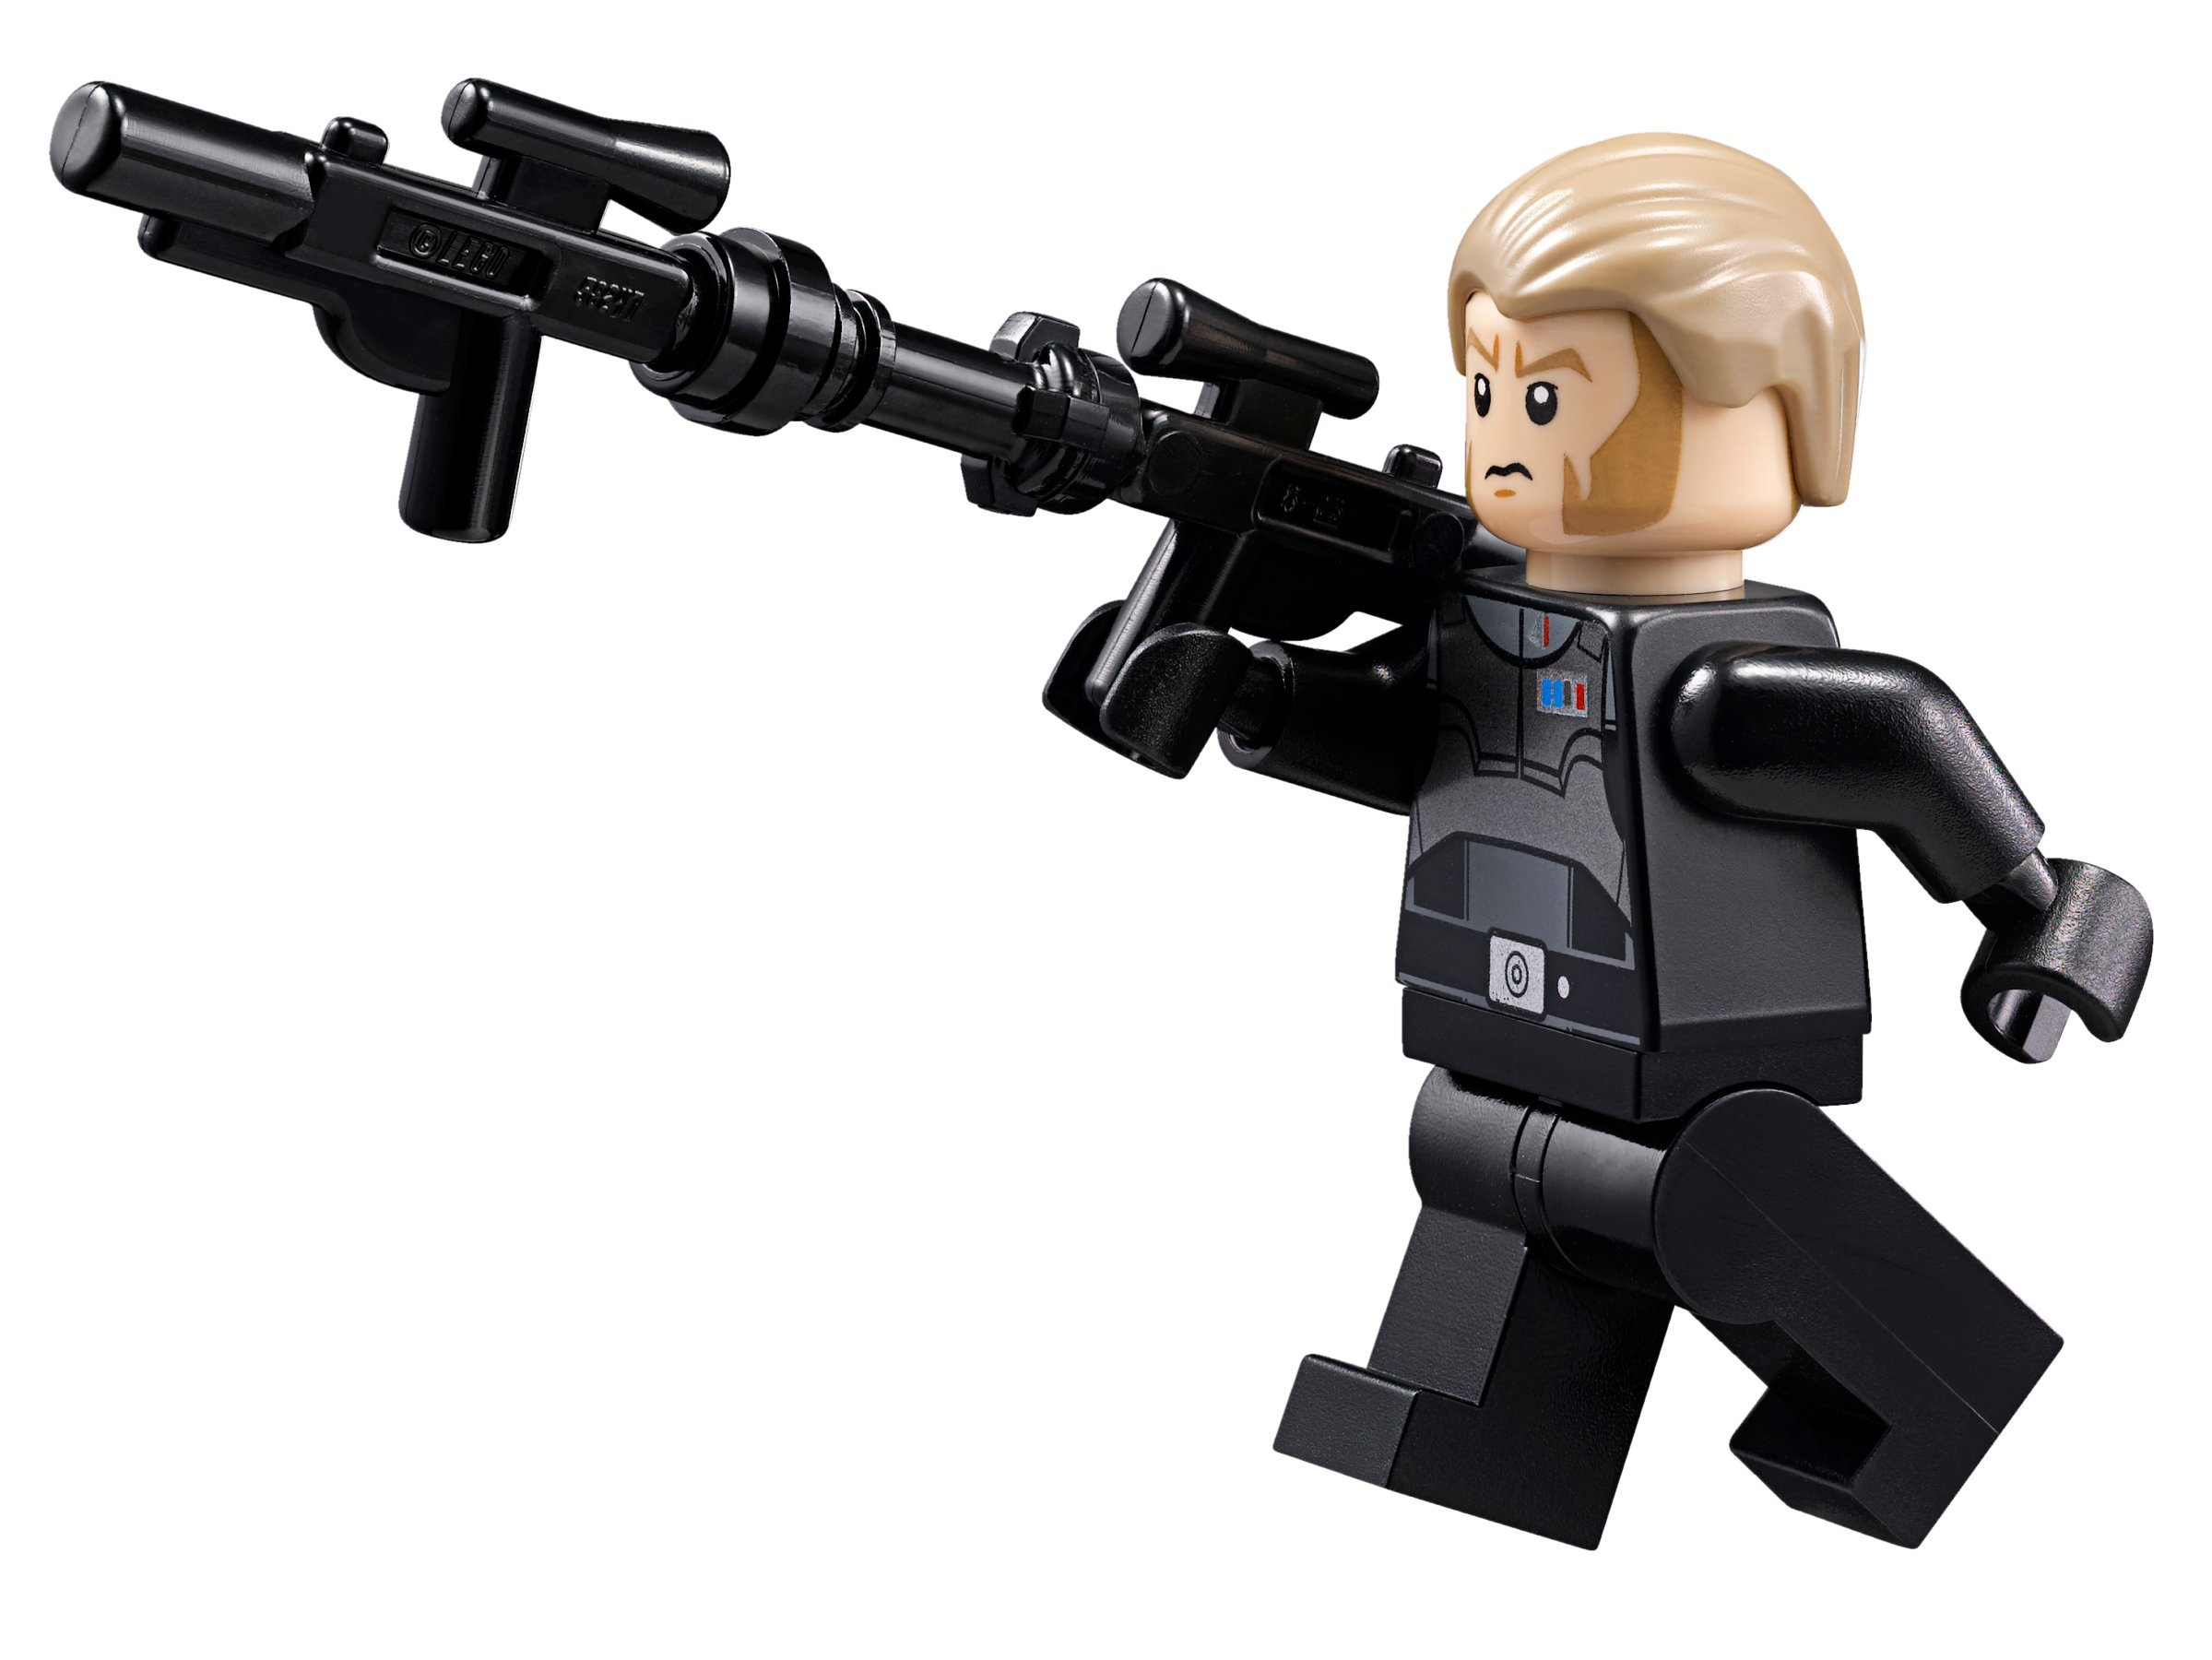 LEGO Star Wars Rebels Imperial Assault Carrier 1216 Piece Building Kit | 75106